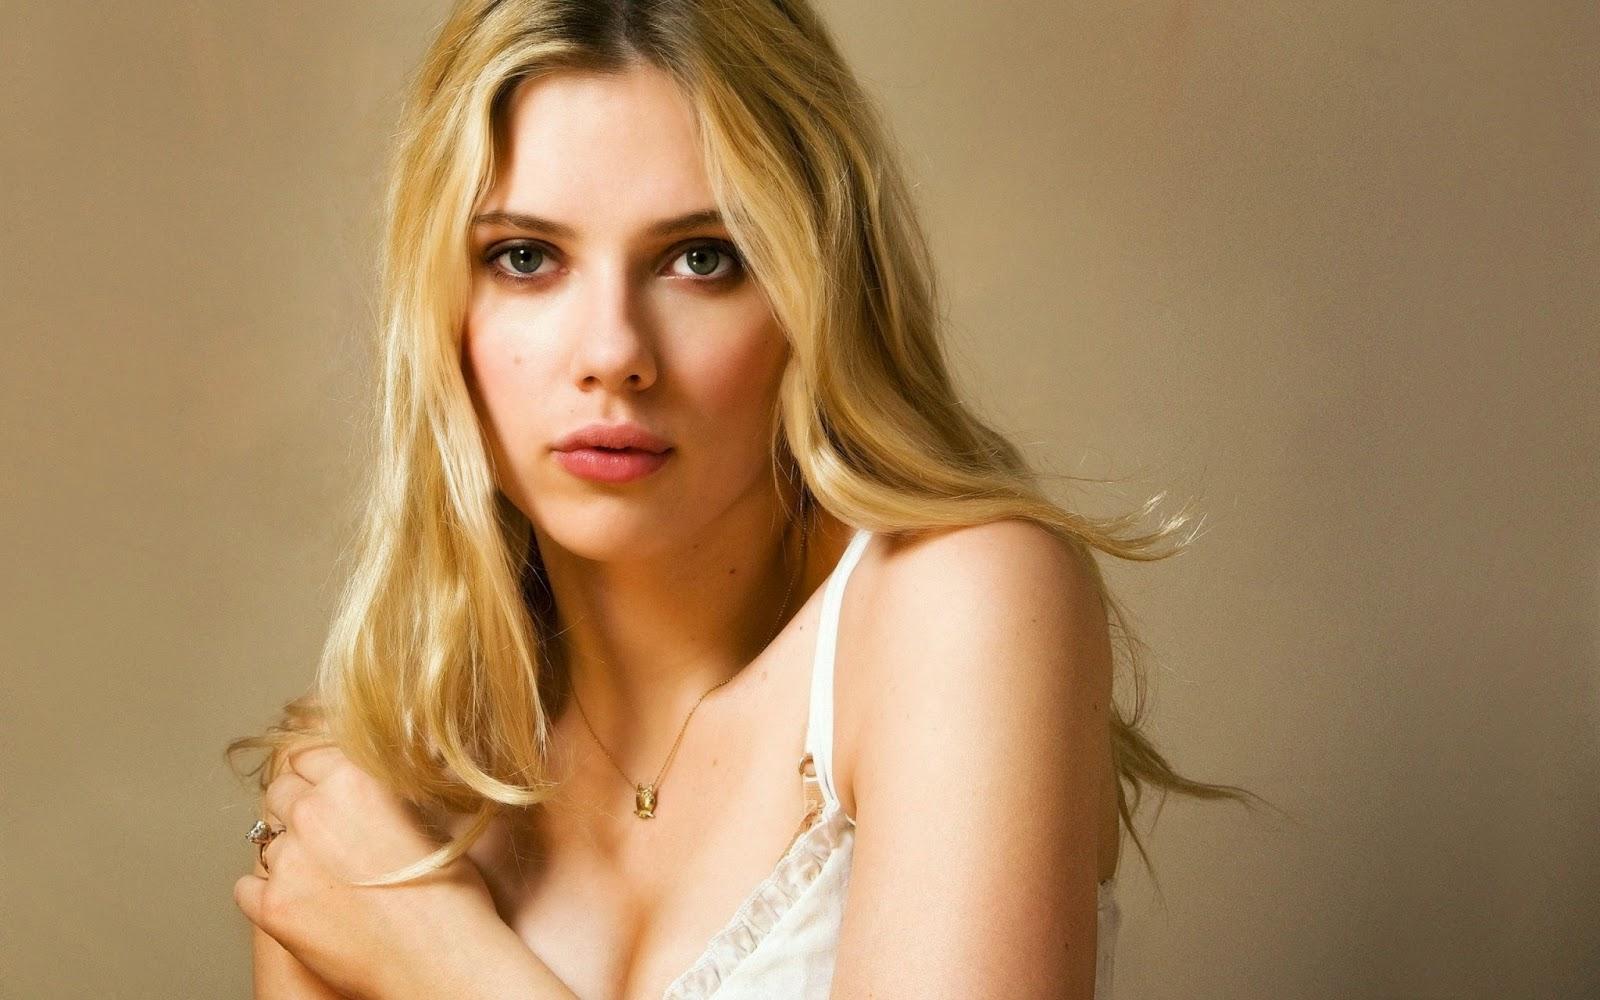 New Latest Wallpaper Celebrity Scarlett Johansson